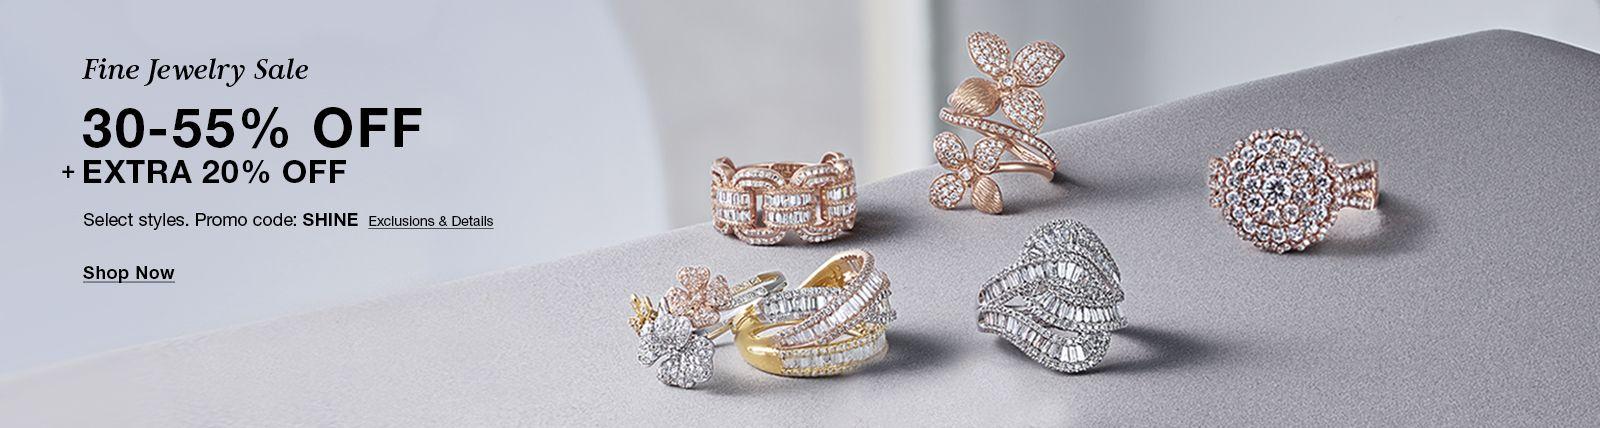 Macy's - Shop Fashion Clothing & Accessories - Official Site - Macys com